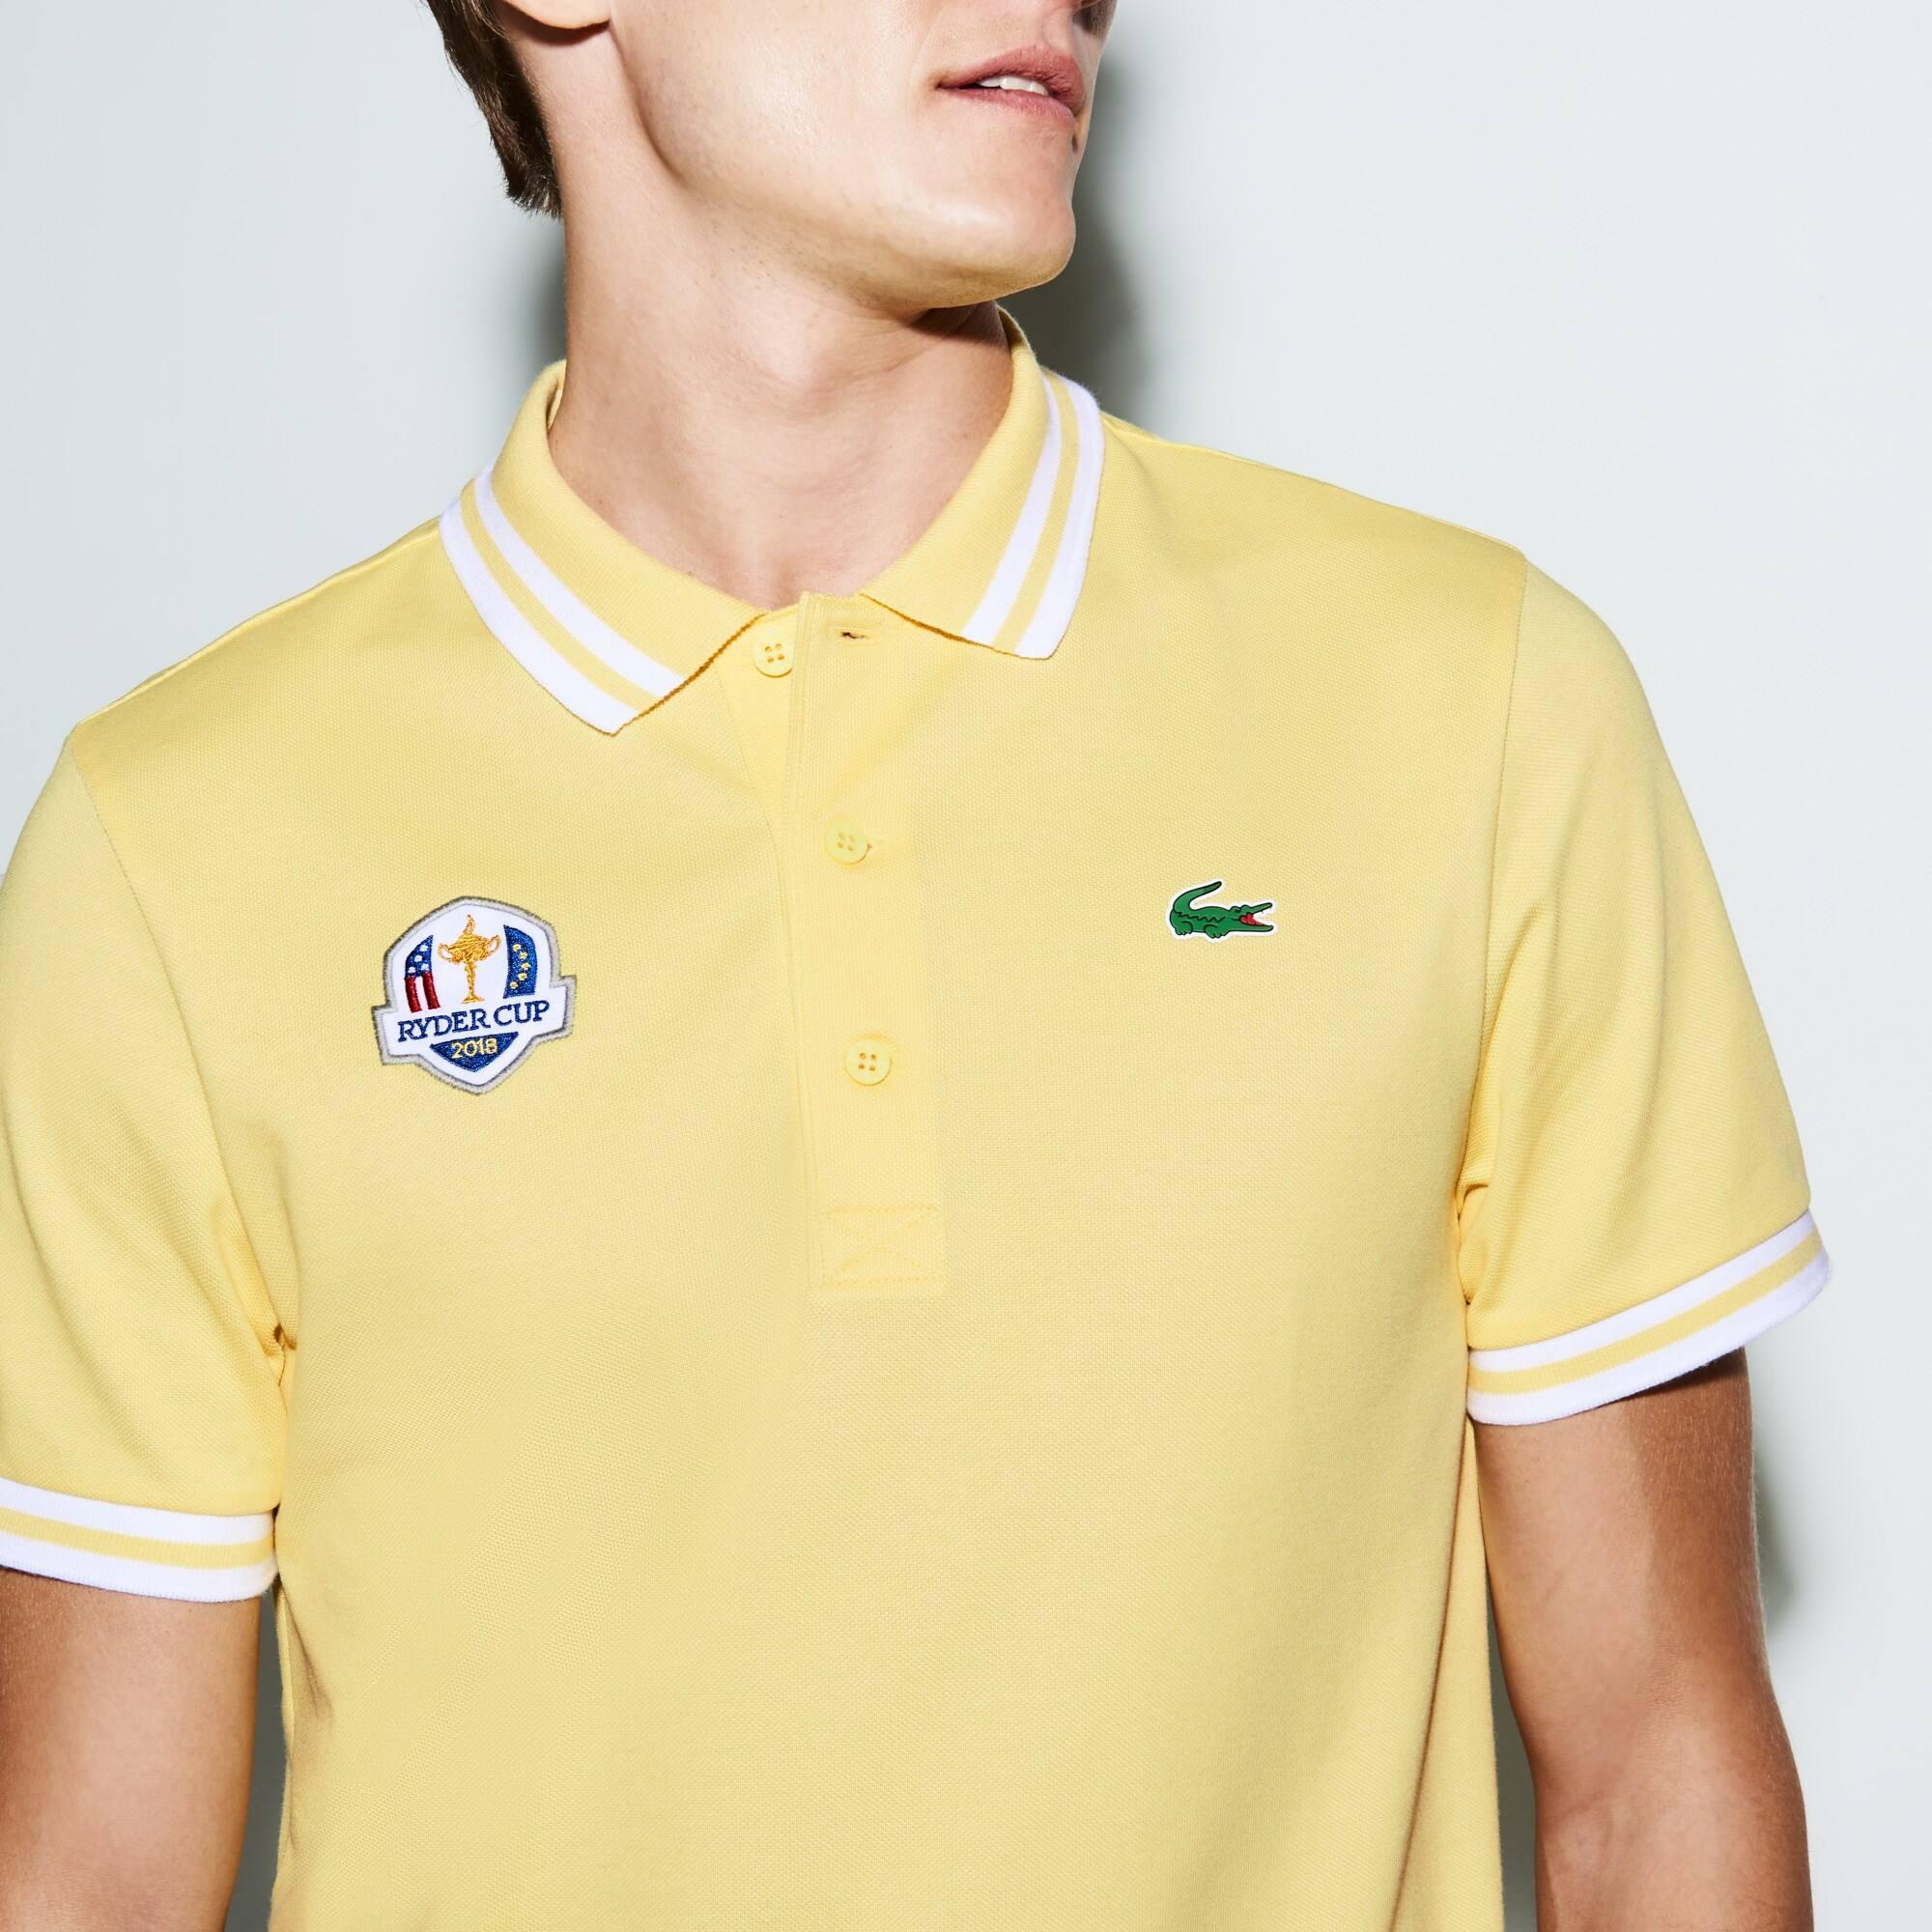 Lacoste - Herren LACOSTE SPORT Ryder Cup Edition Golf Poloshirt - 4